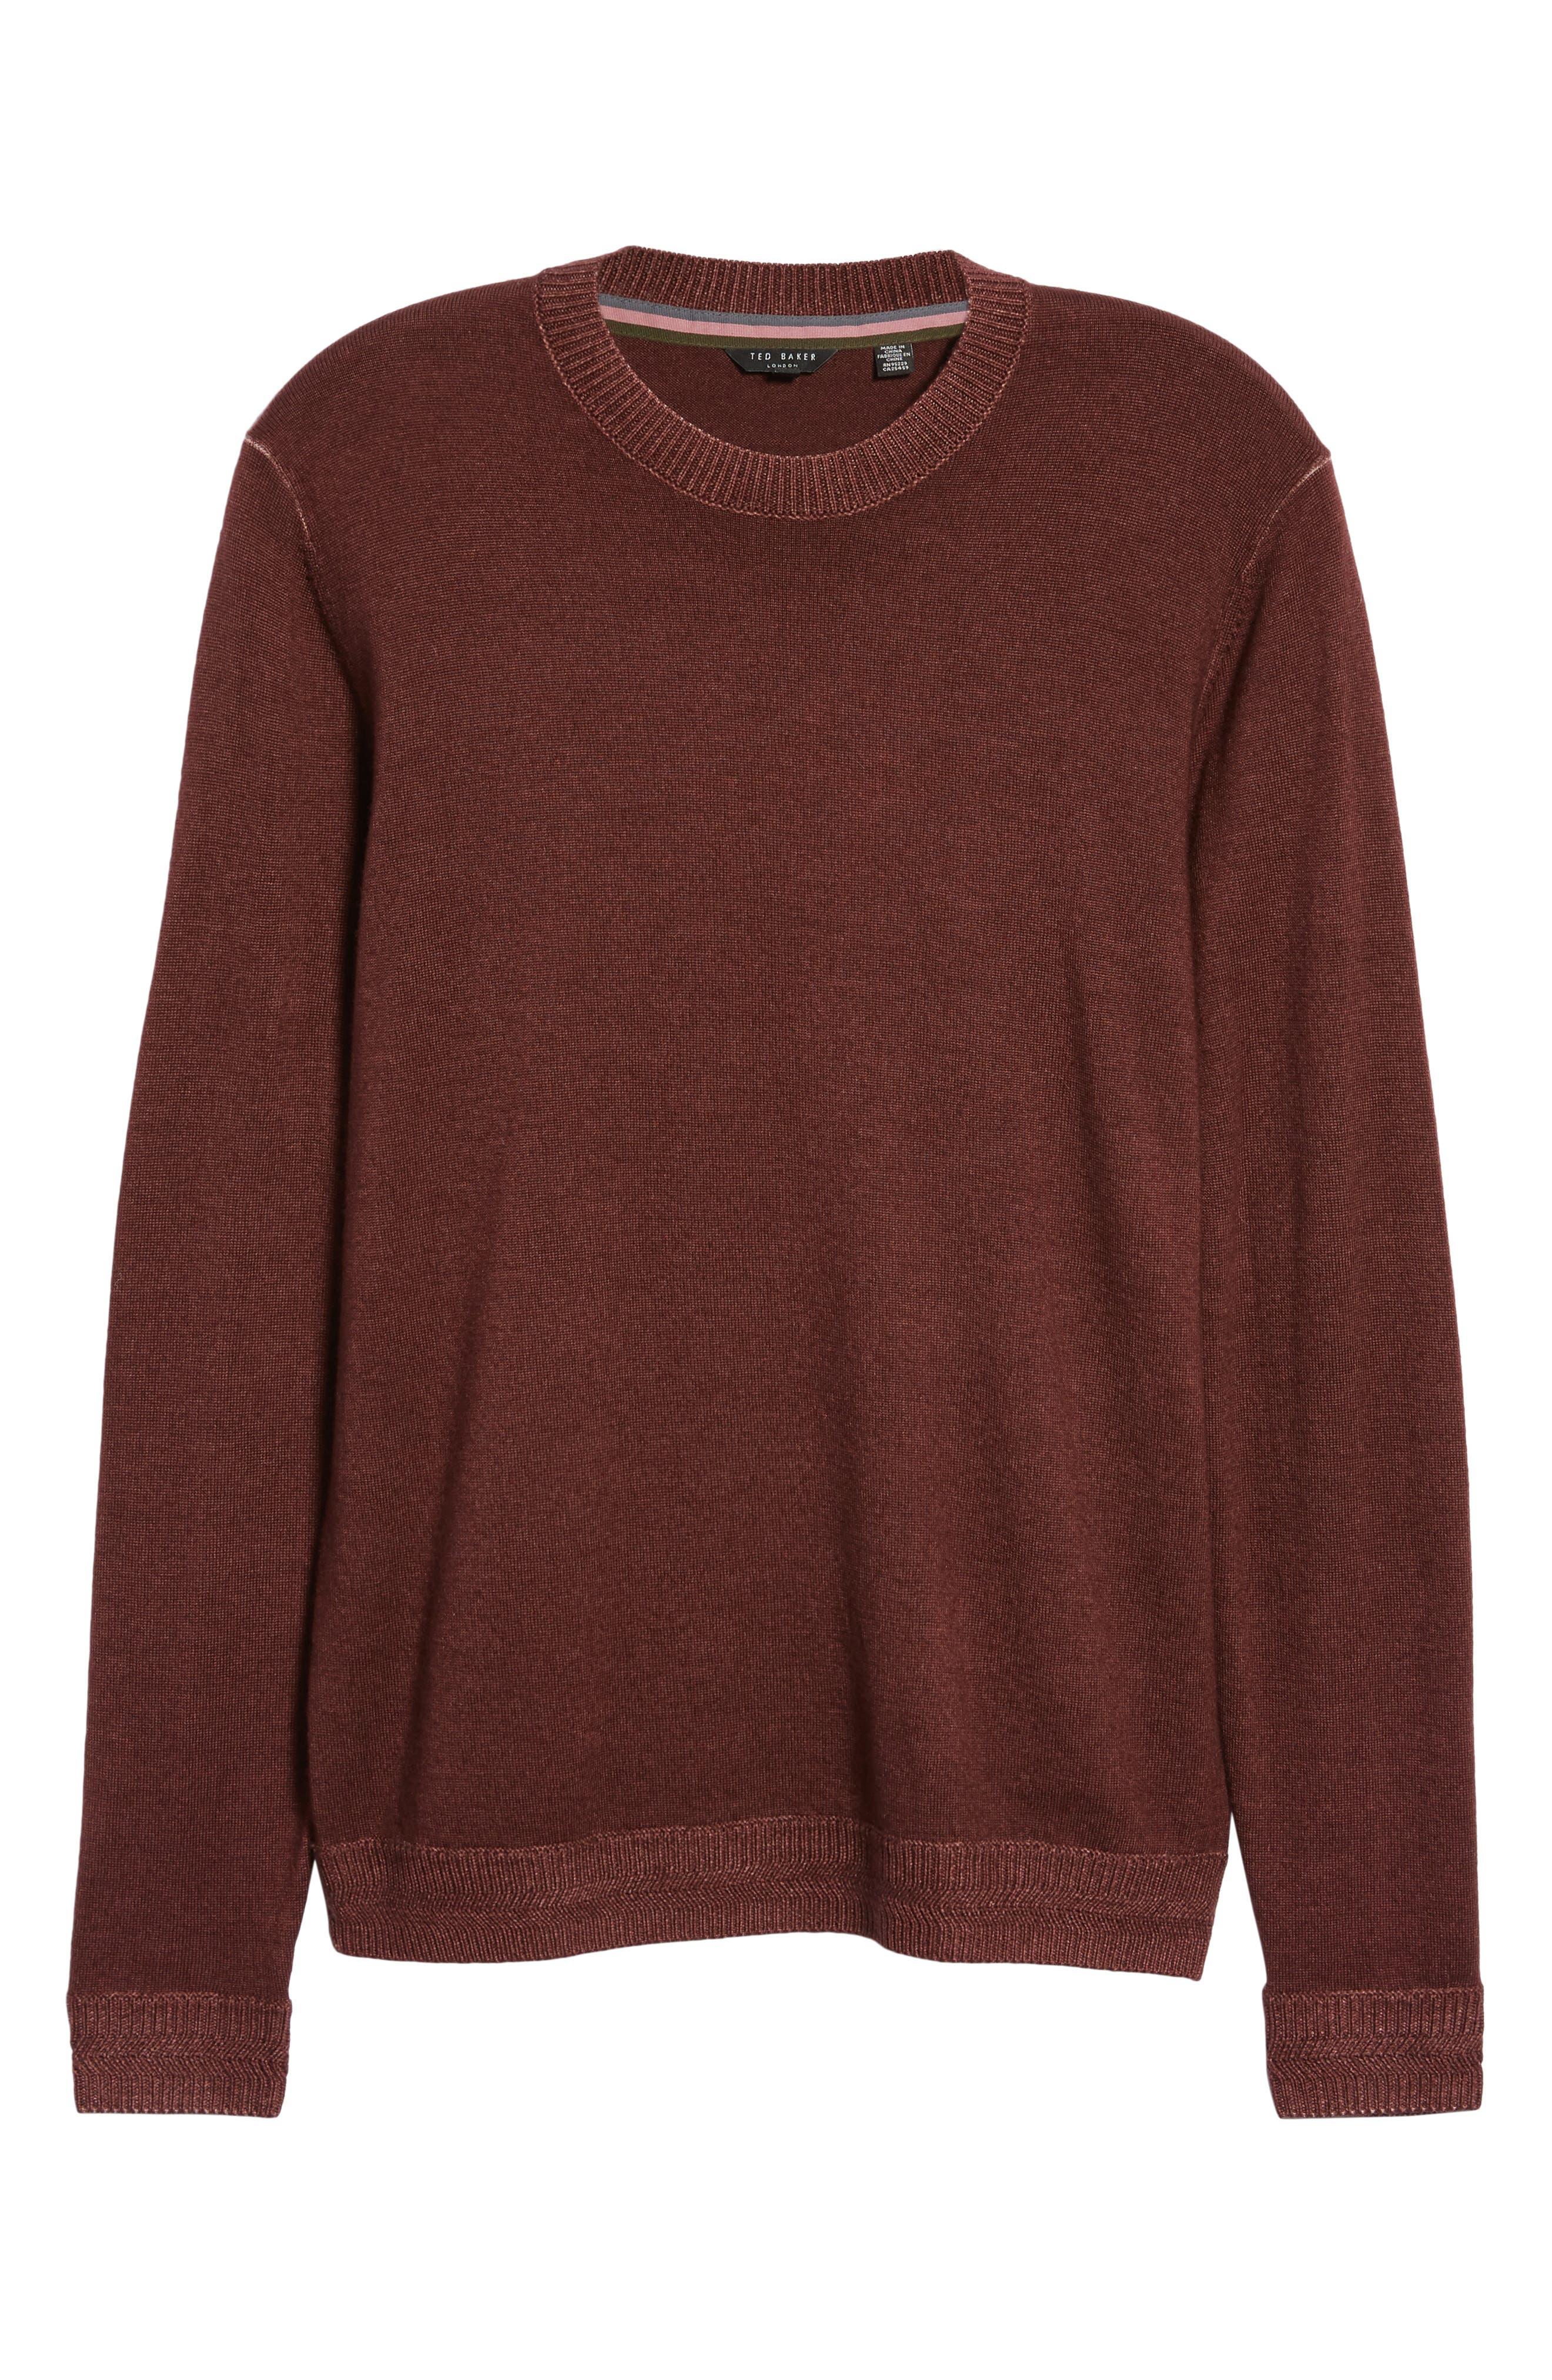 Trim Fit Newab Garment Dyed Wool Sweater,                             Alternate thumbnail 6, color,                             MAROON